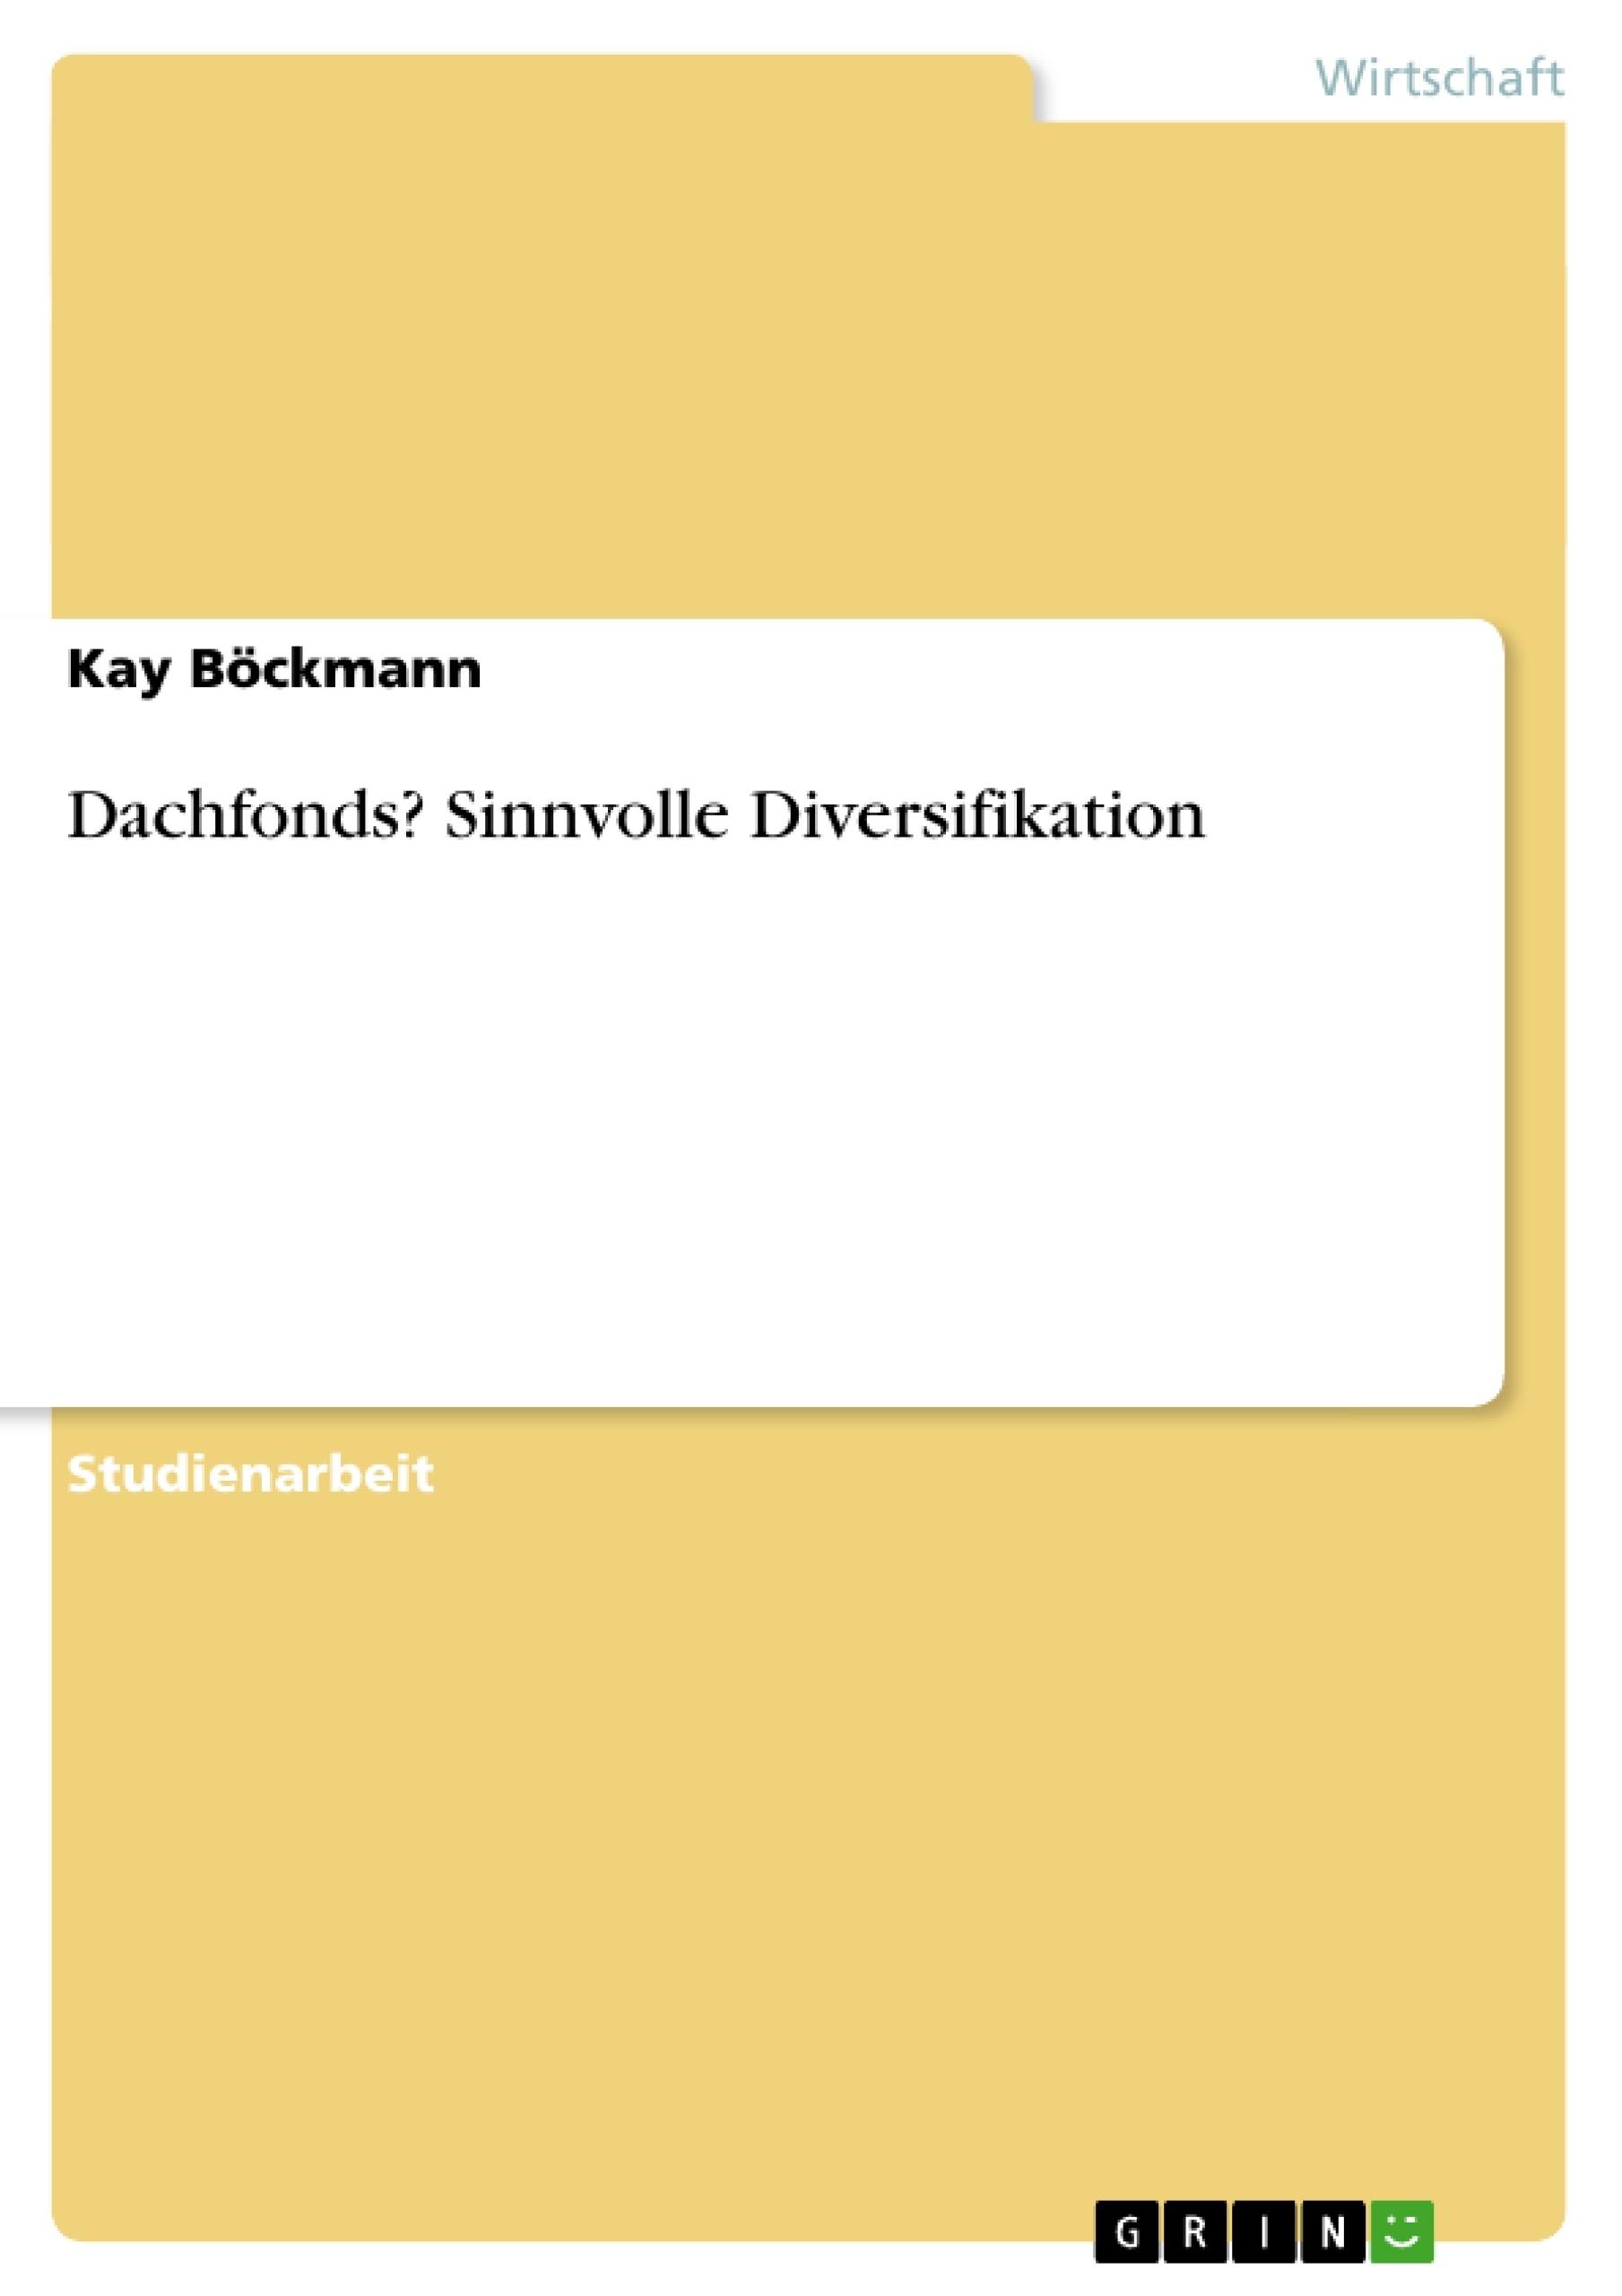 Titel: Dachfonds? Sinnvolle Diversifikation